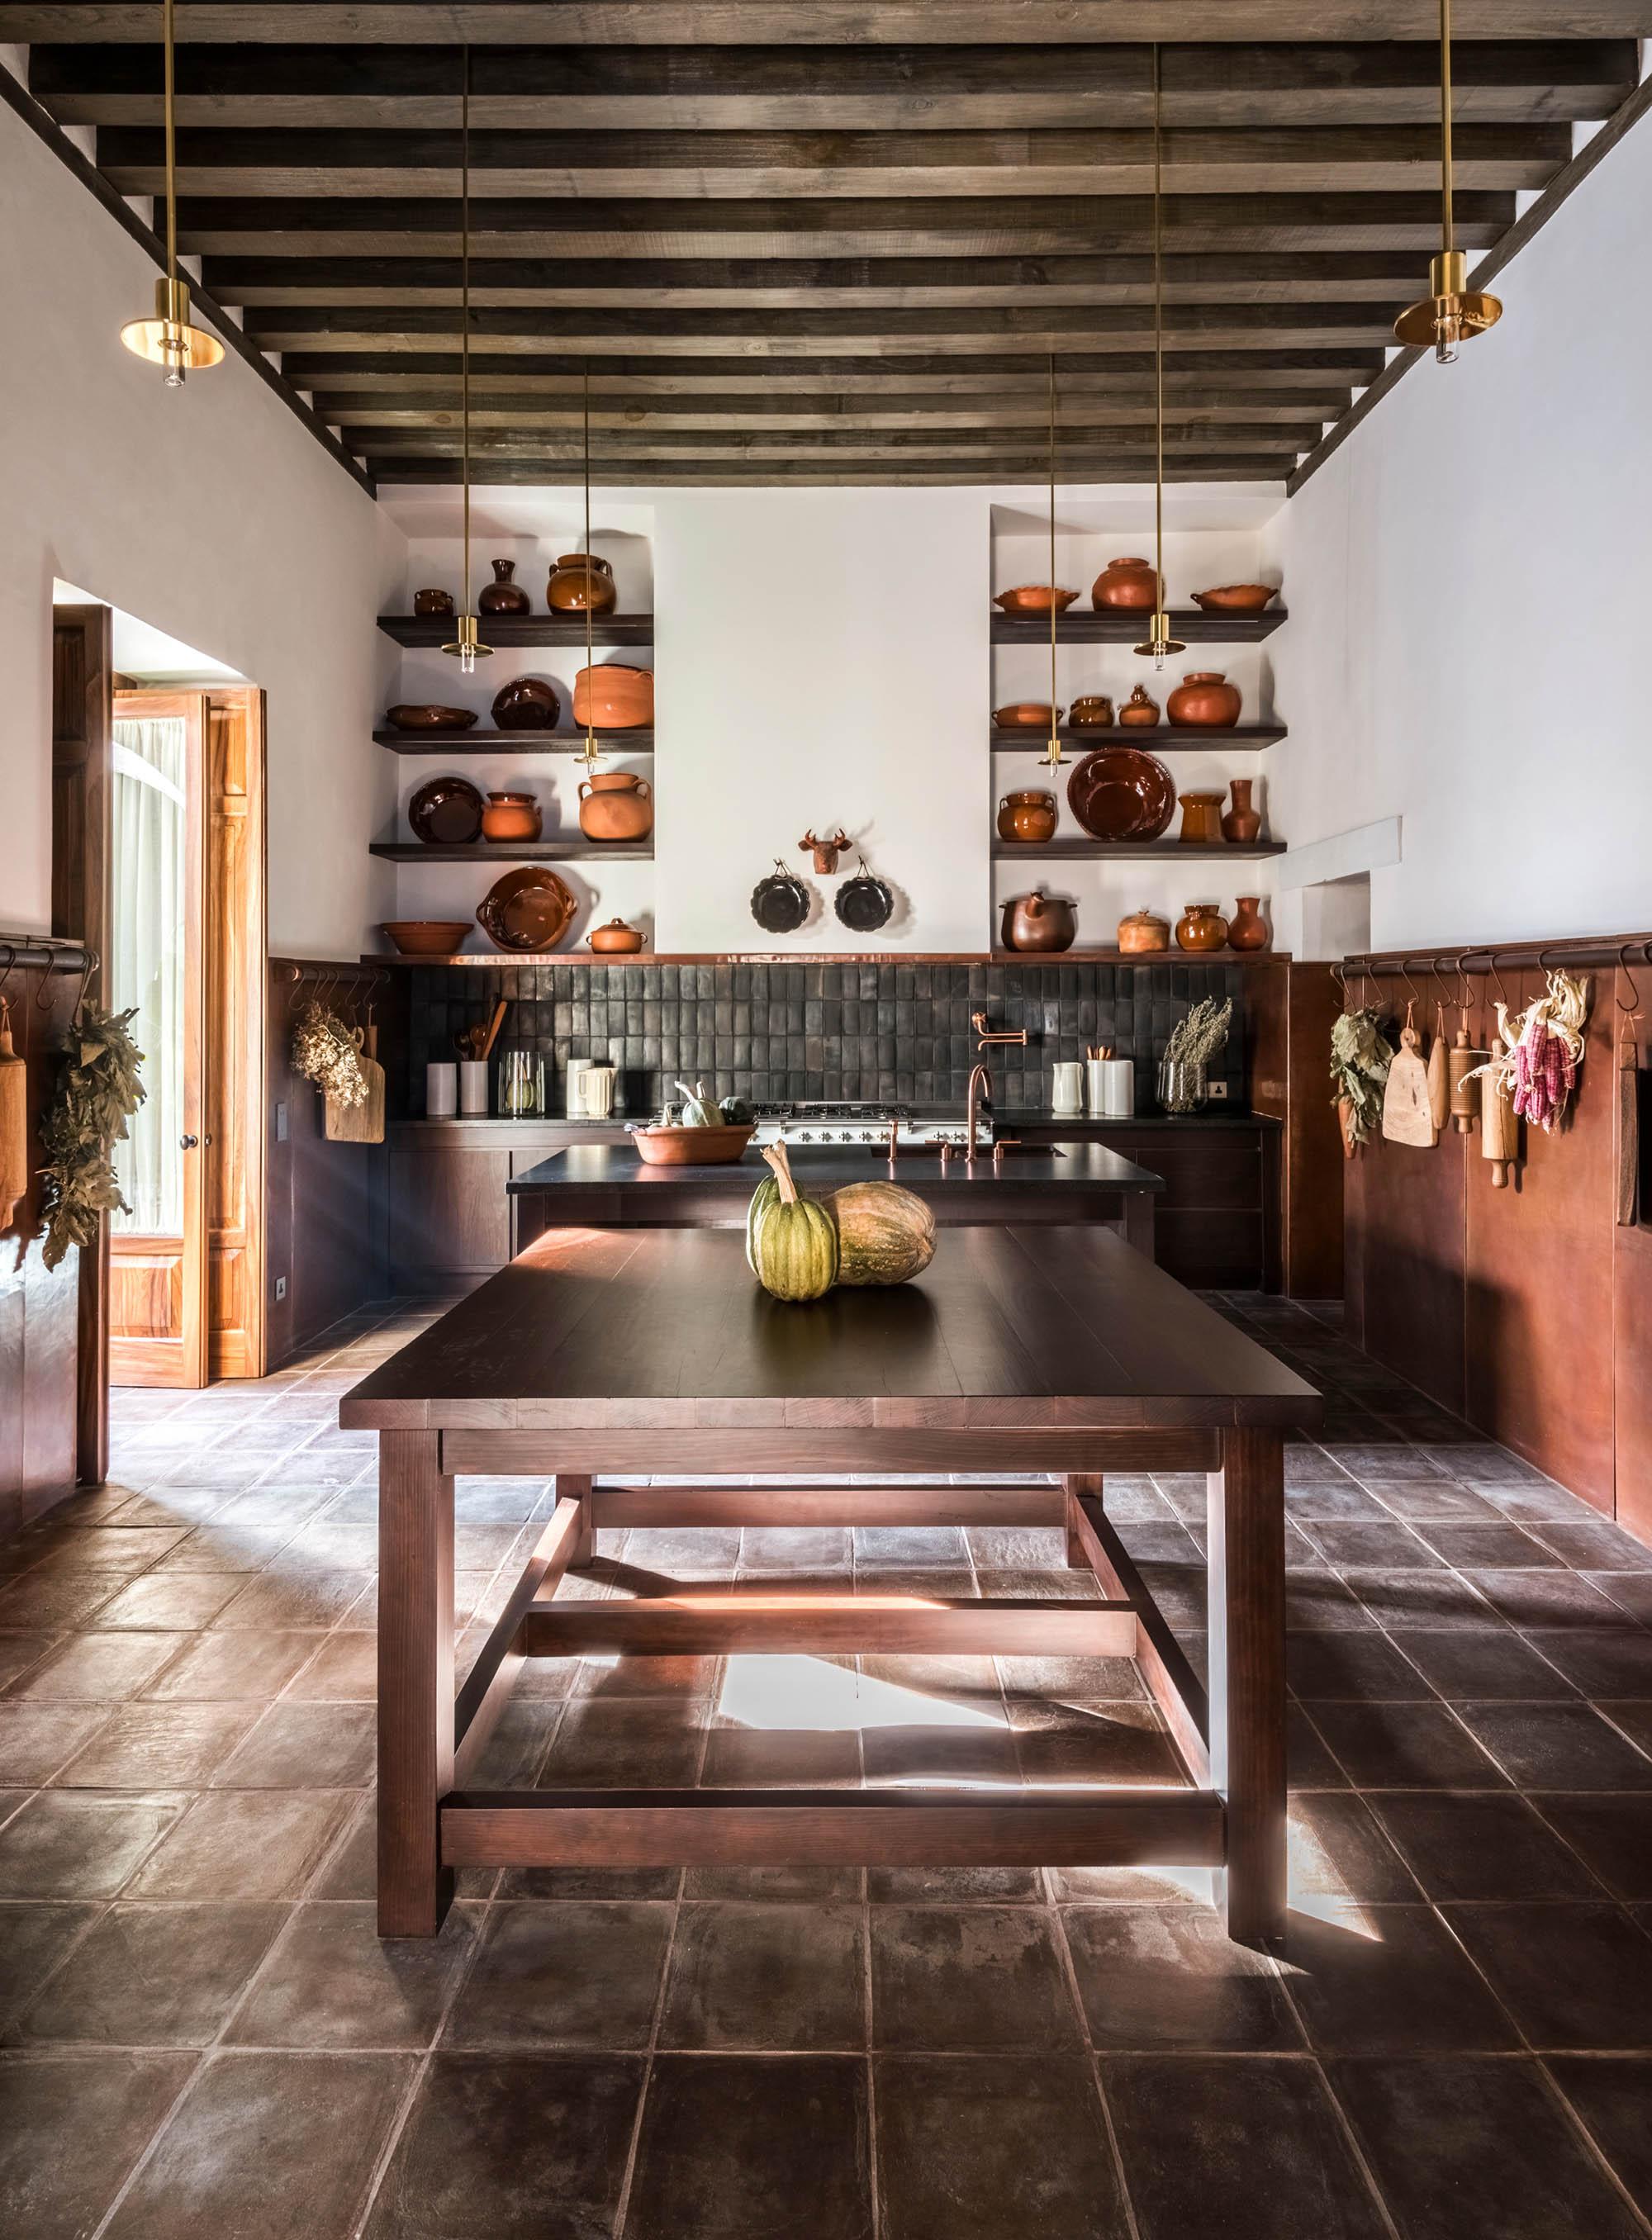 luis_laplace-Casa_Michelena_Morelia-4